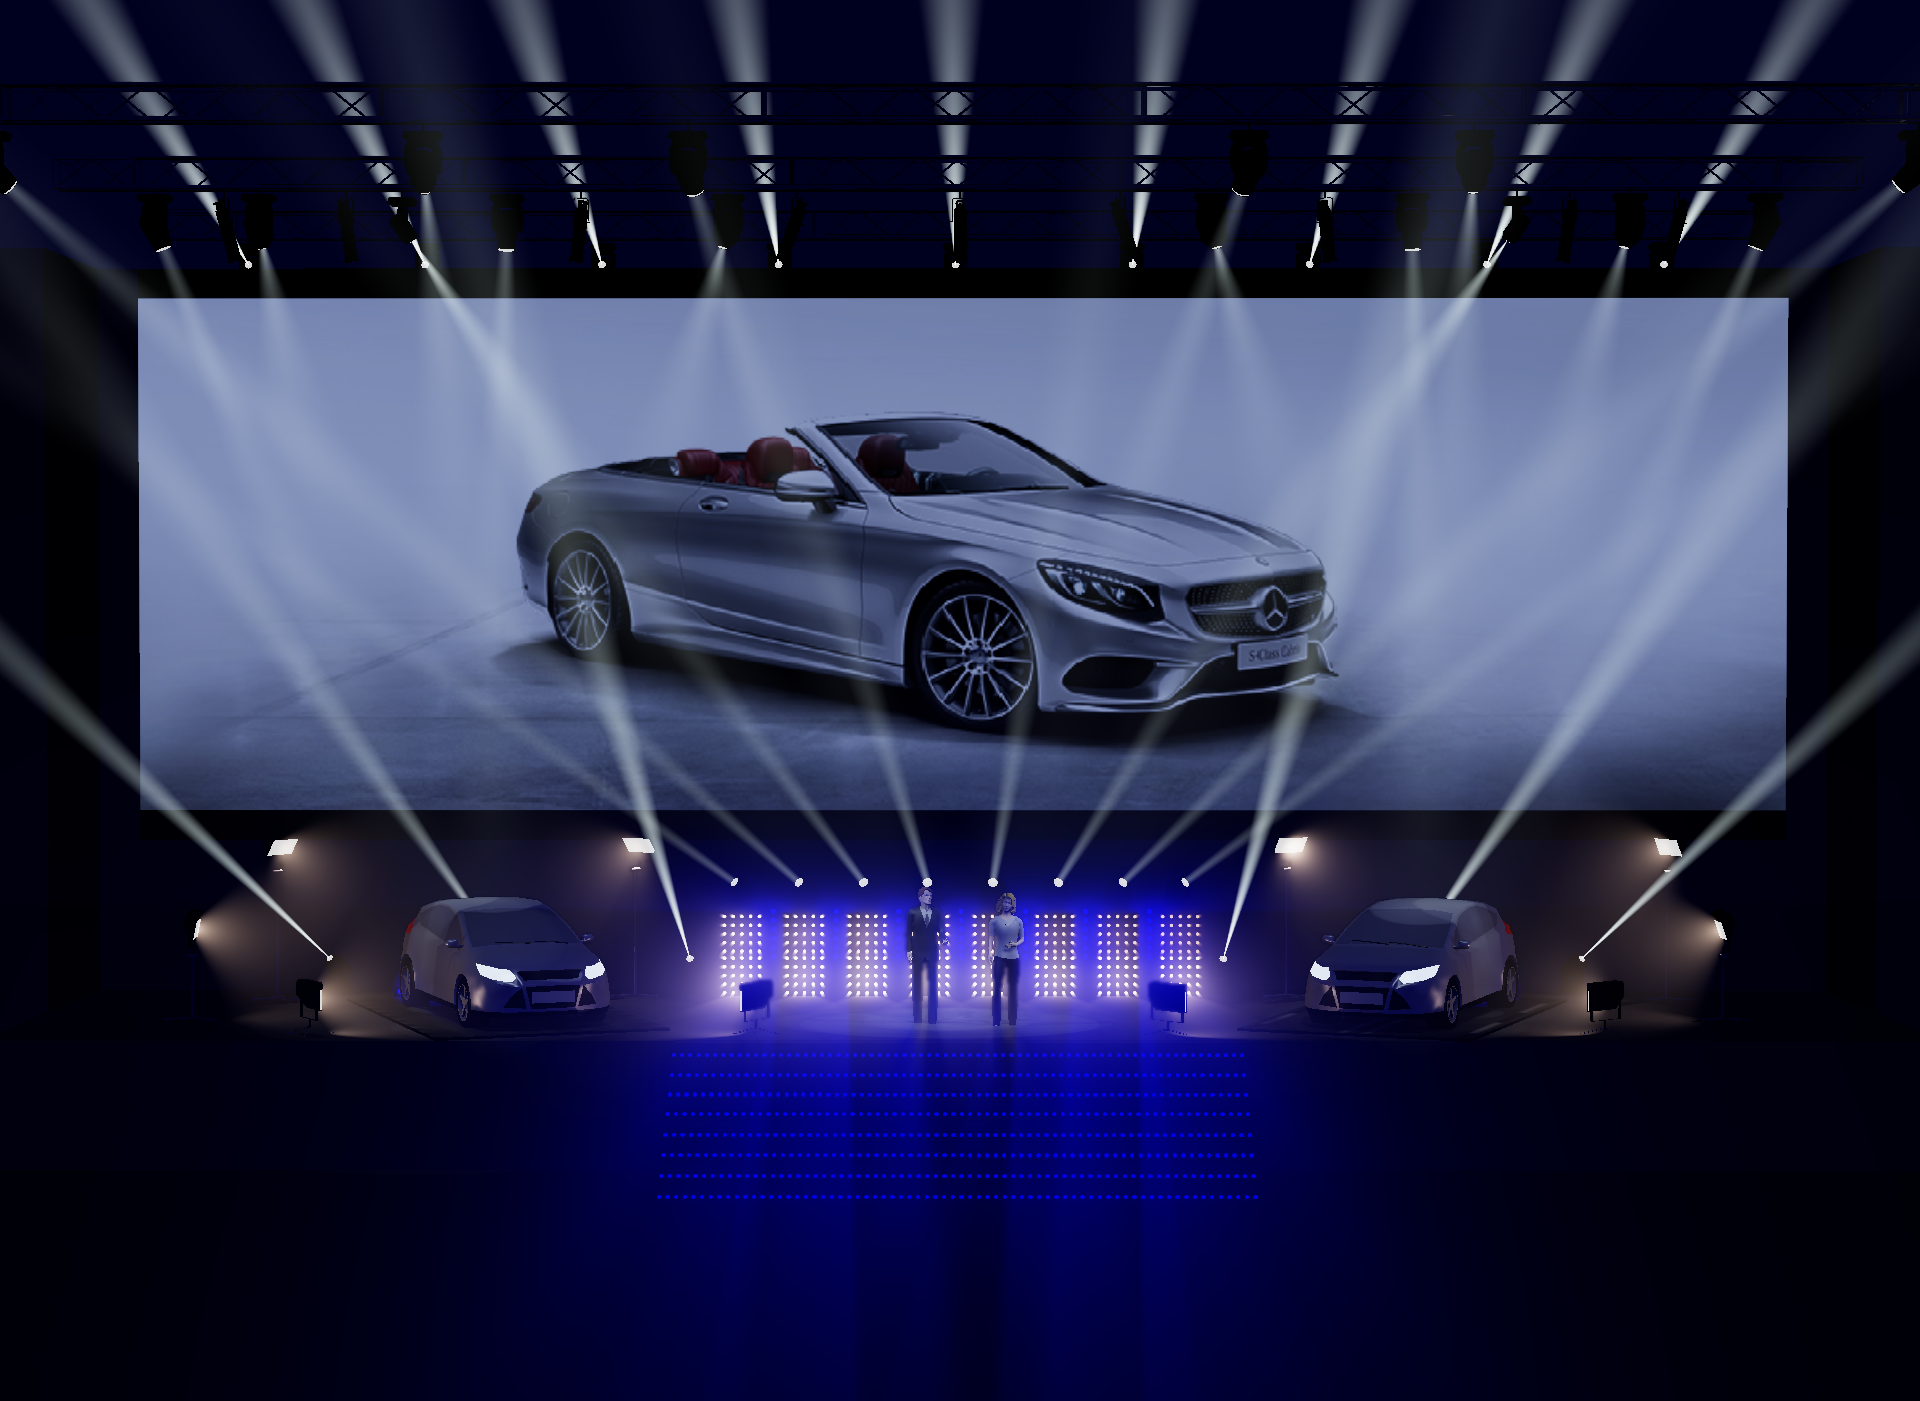 Mercedes_CCW_render Mix blu.PNG